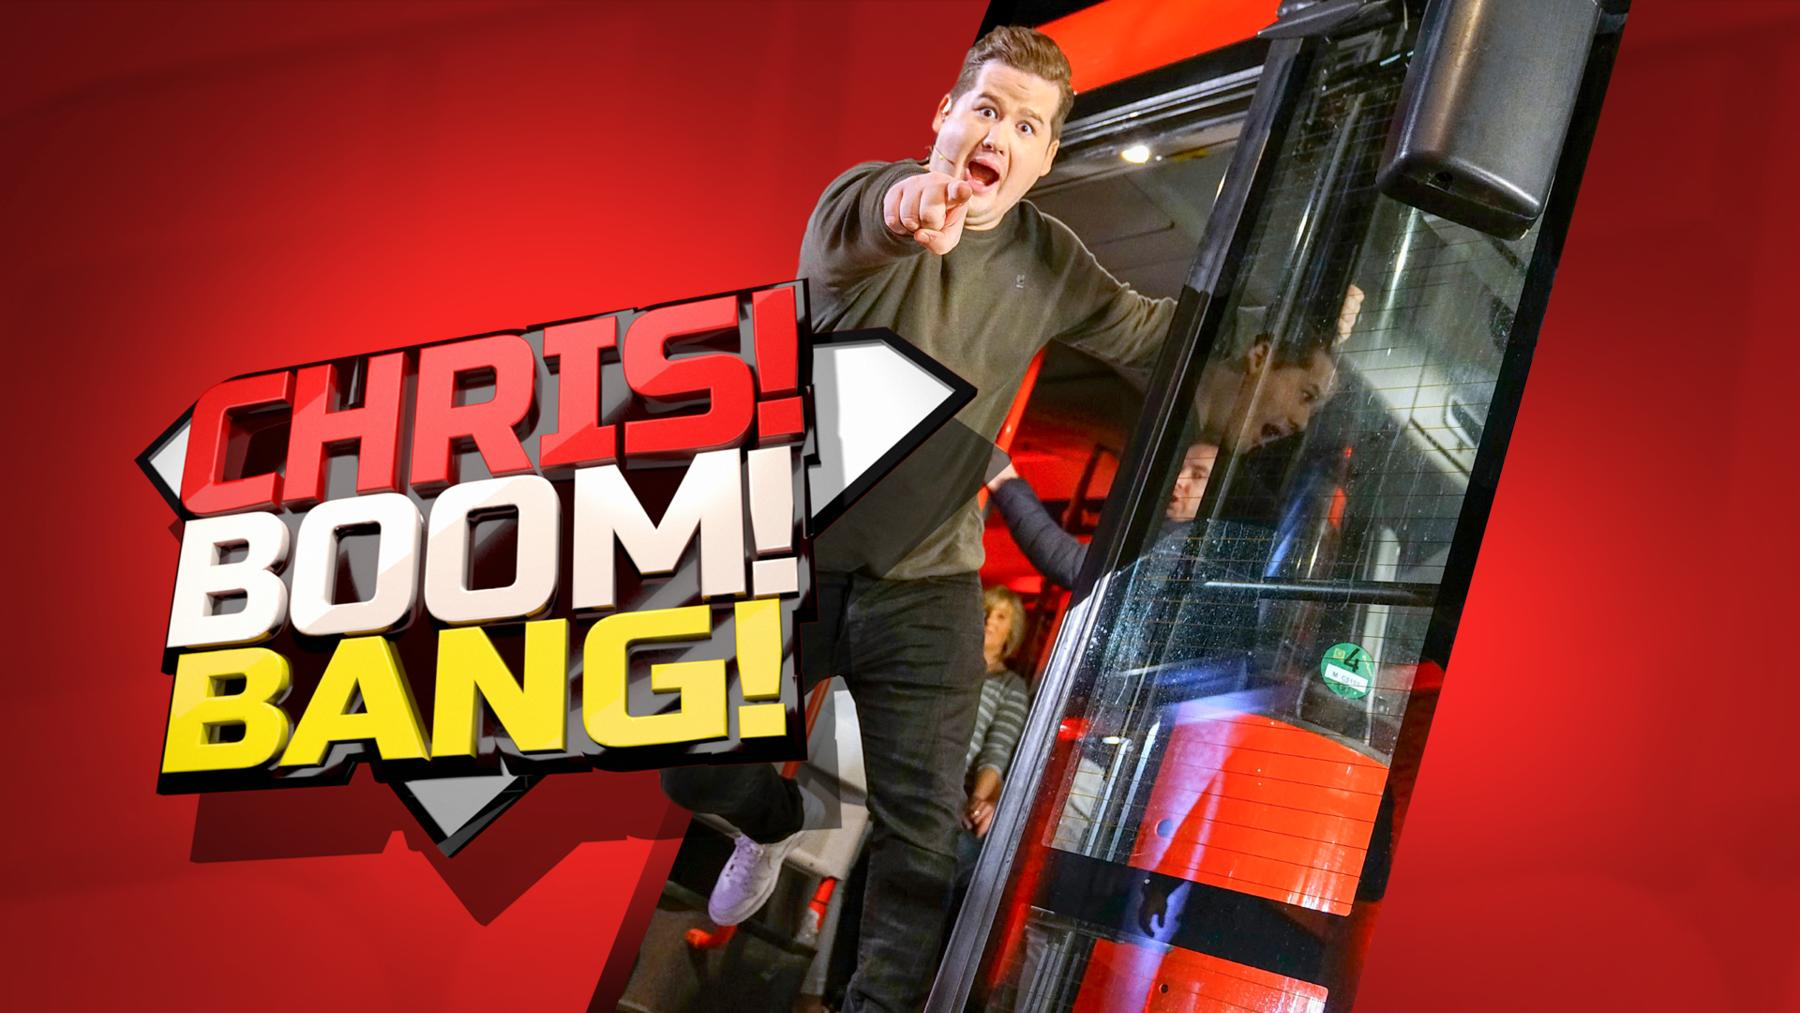 Chris! Boom! Bang!